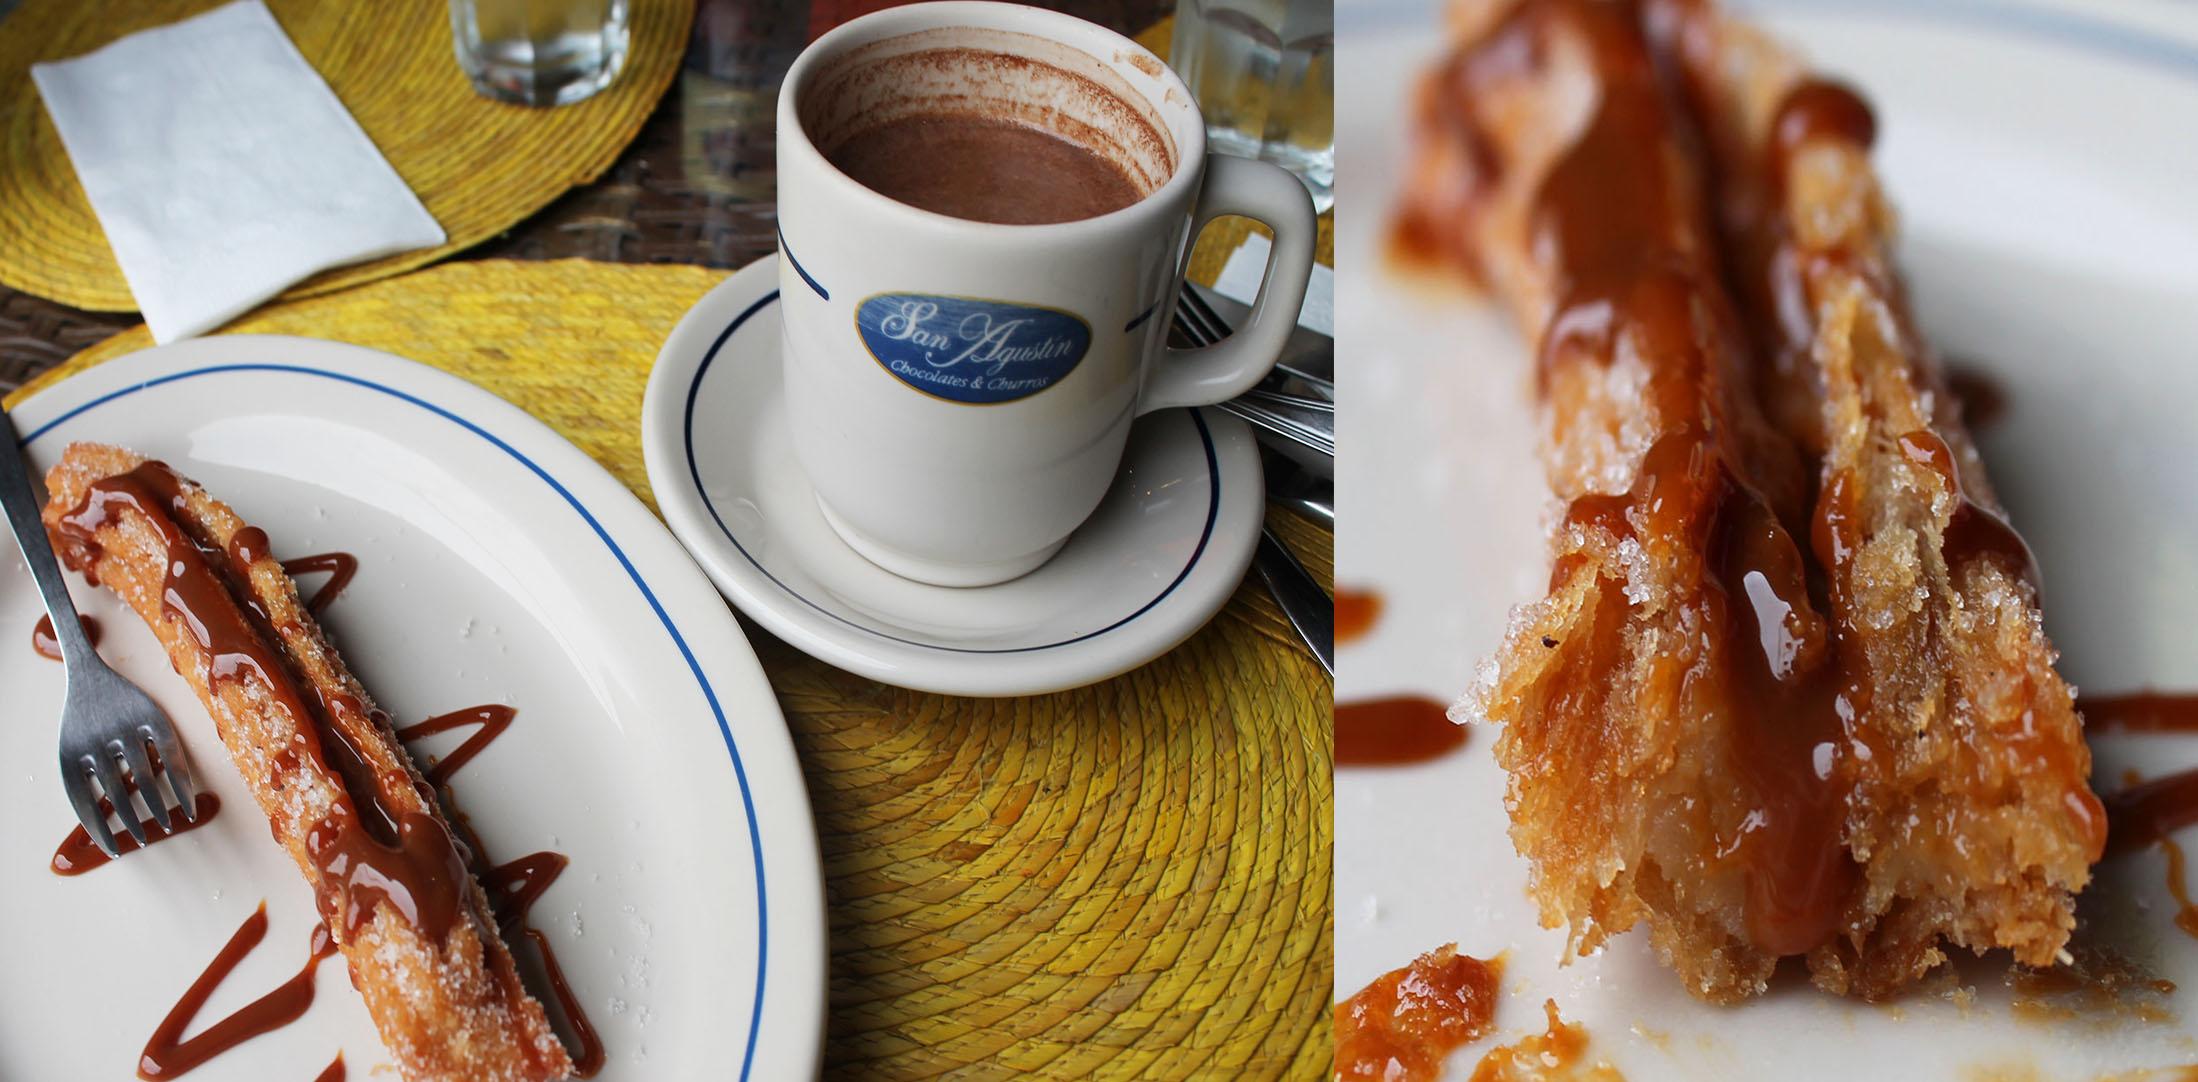 Cafe Firenze Menu San Miguel De Allende